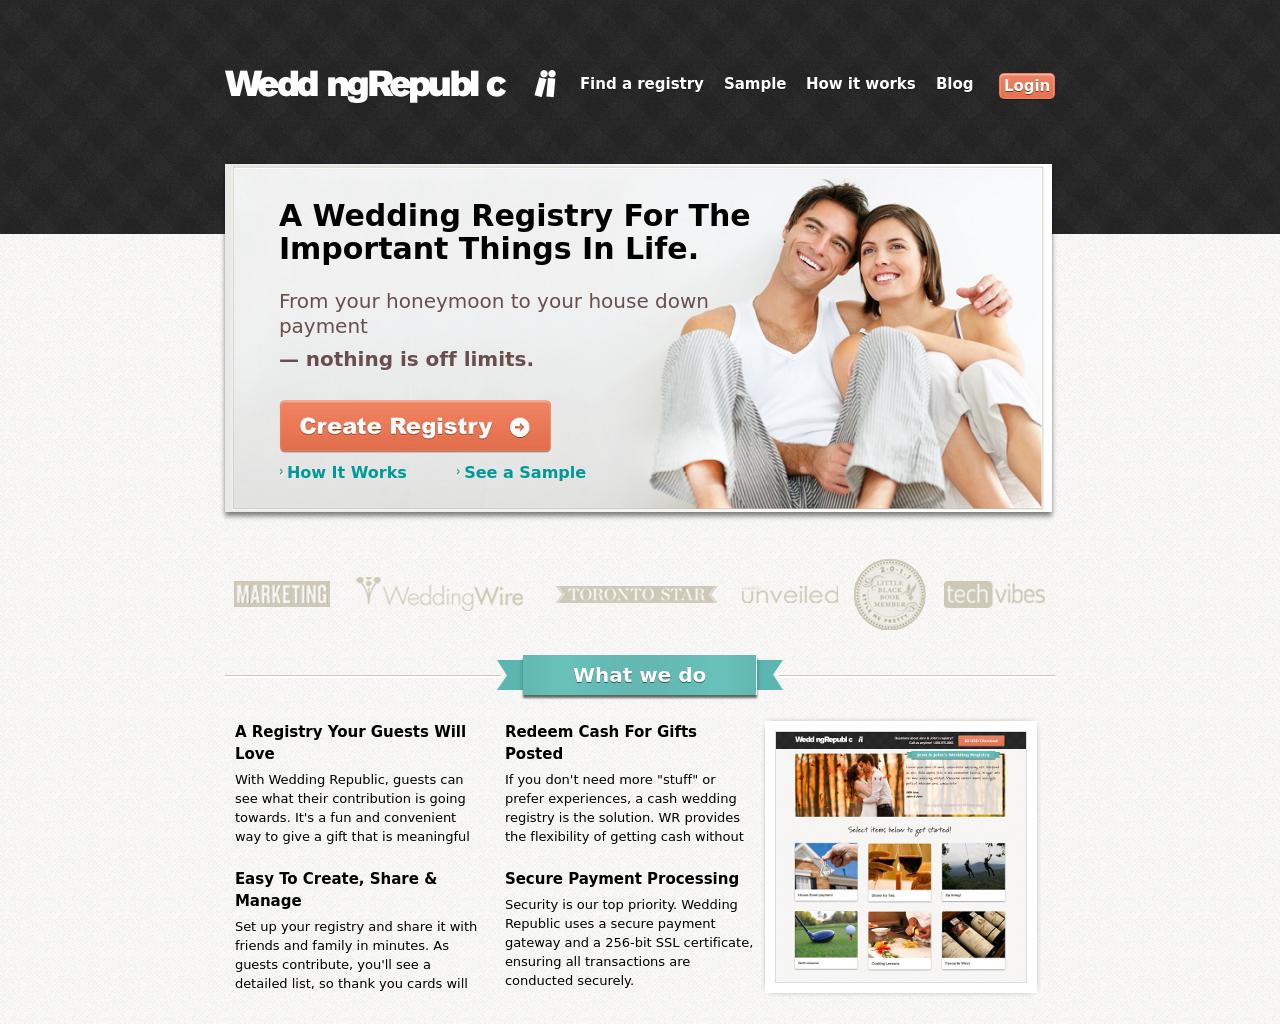 Wedding-Republic-Advertising-Reviews-Pricing